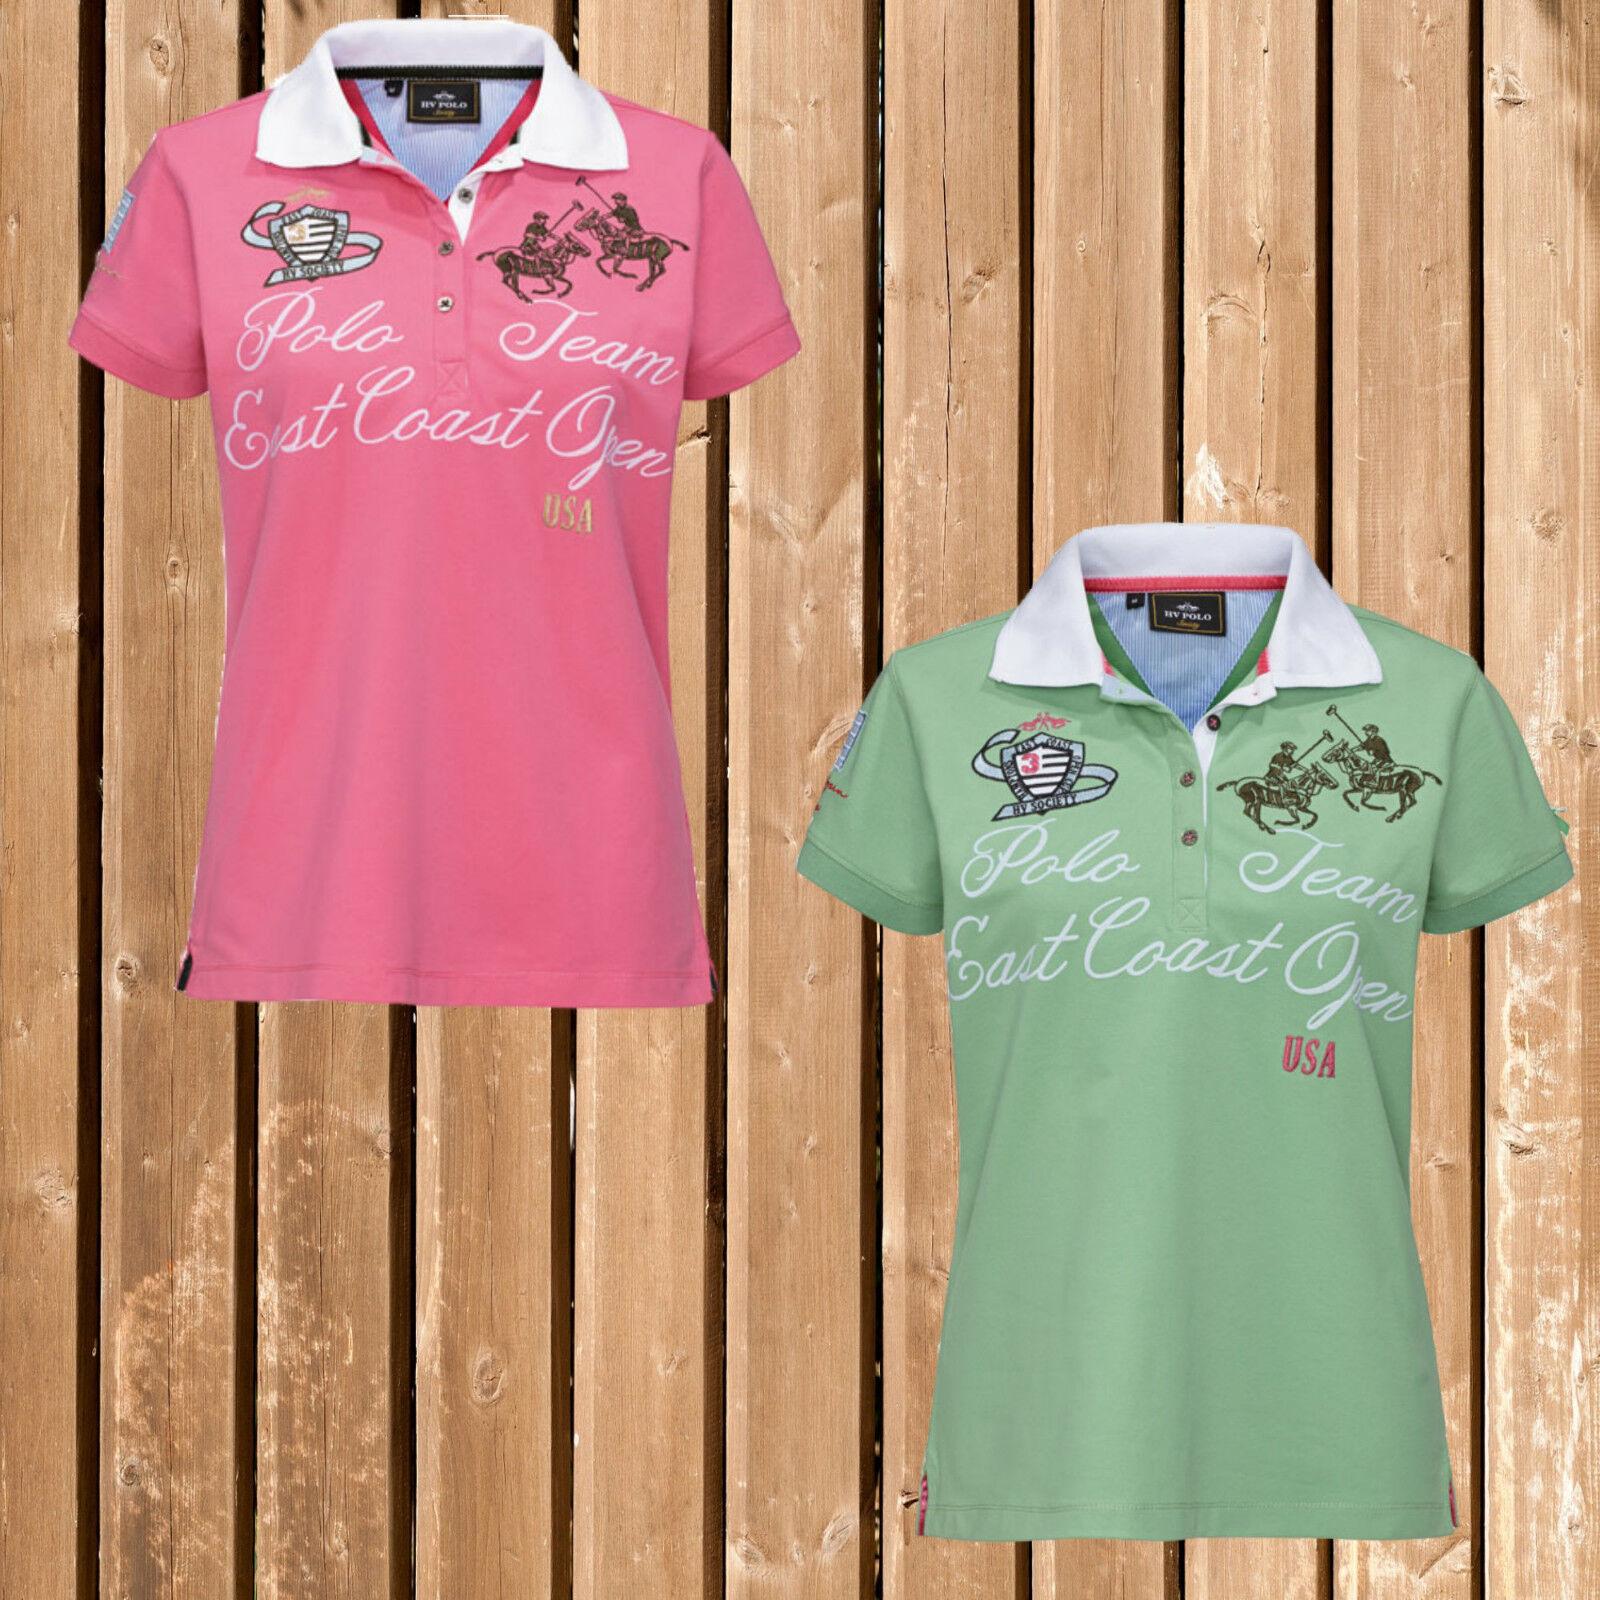 HV POLO SHIRT Halliday, HV Polo Short Sleeve T-Shirt, Polo Shirt Lady Shirt